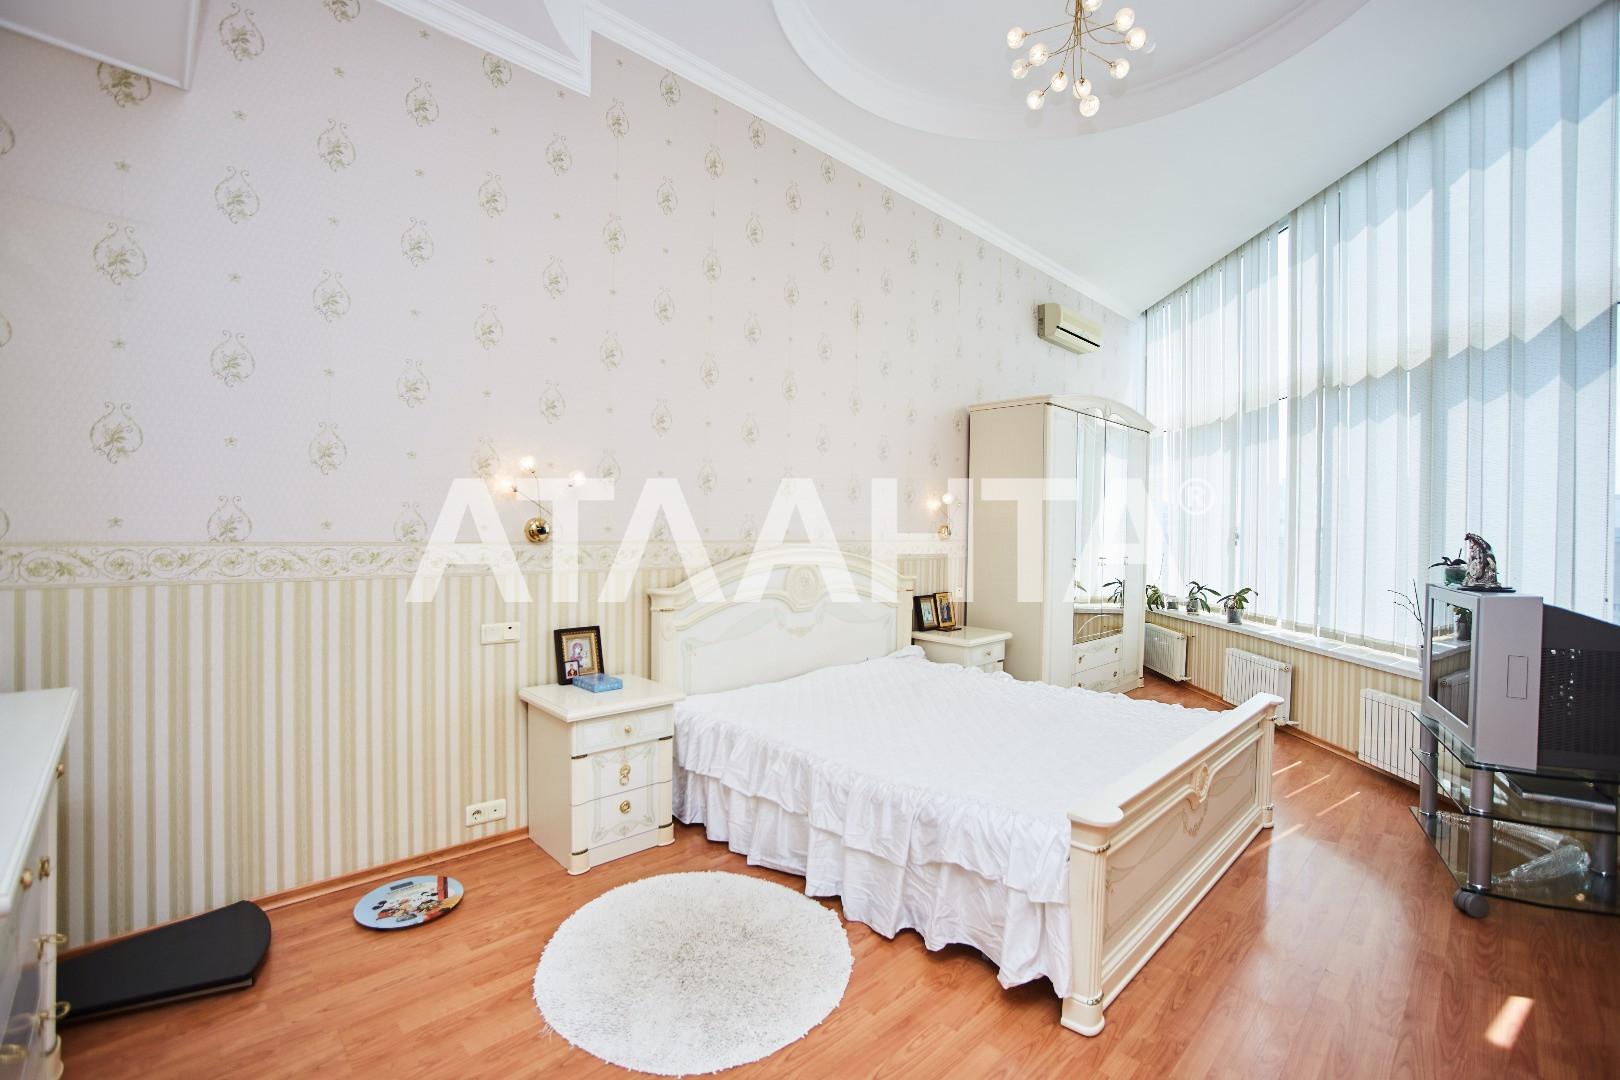 Продается Многоуровневая Квартира на ул. Посмитного — 295 000 у.е. (фото №25)